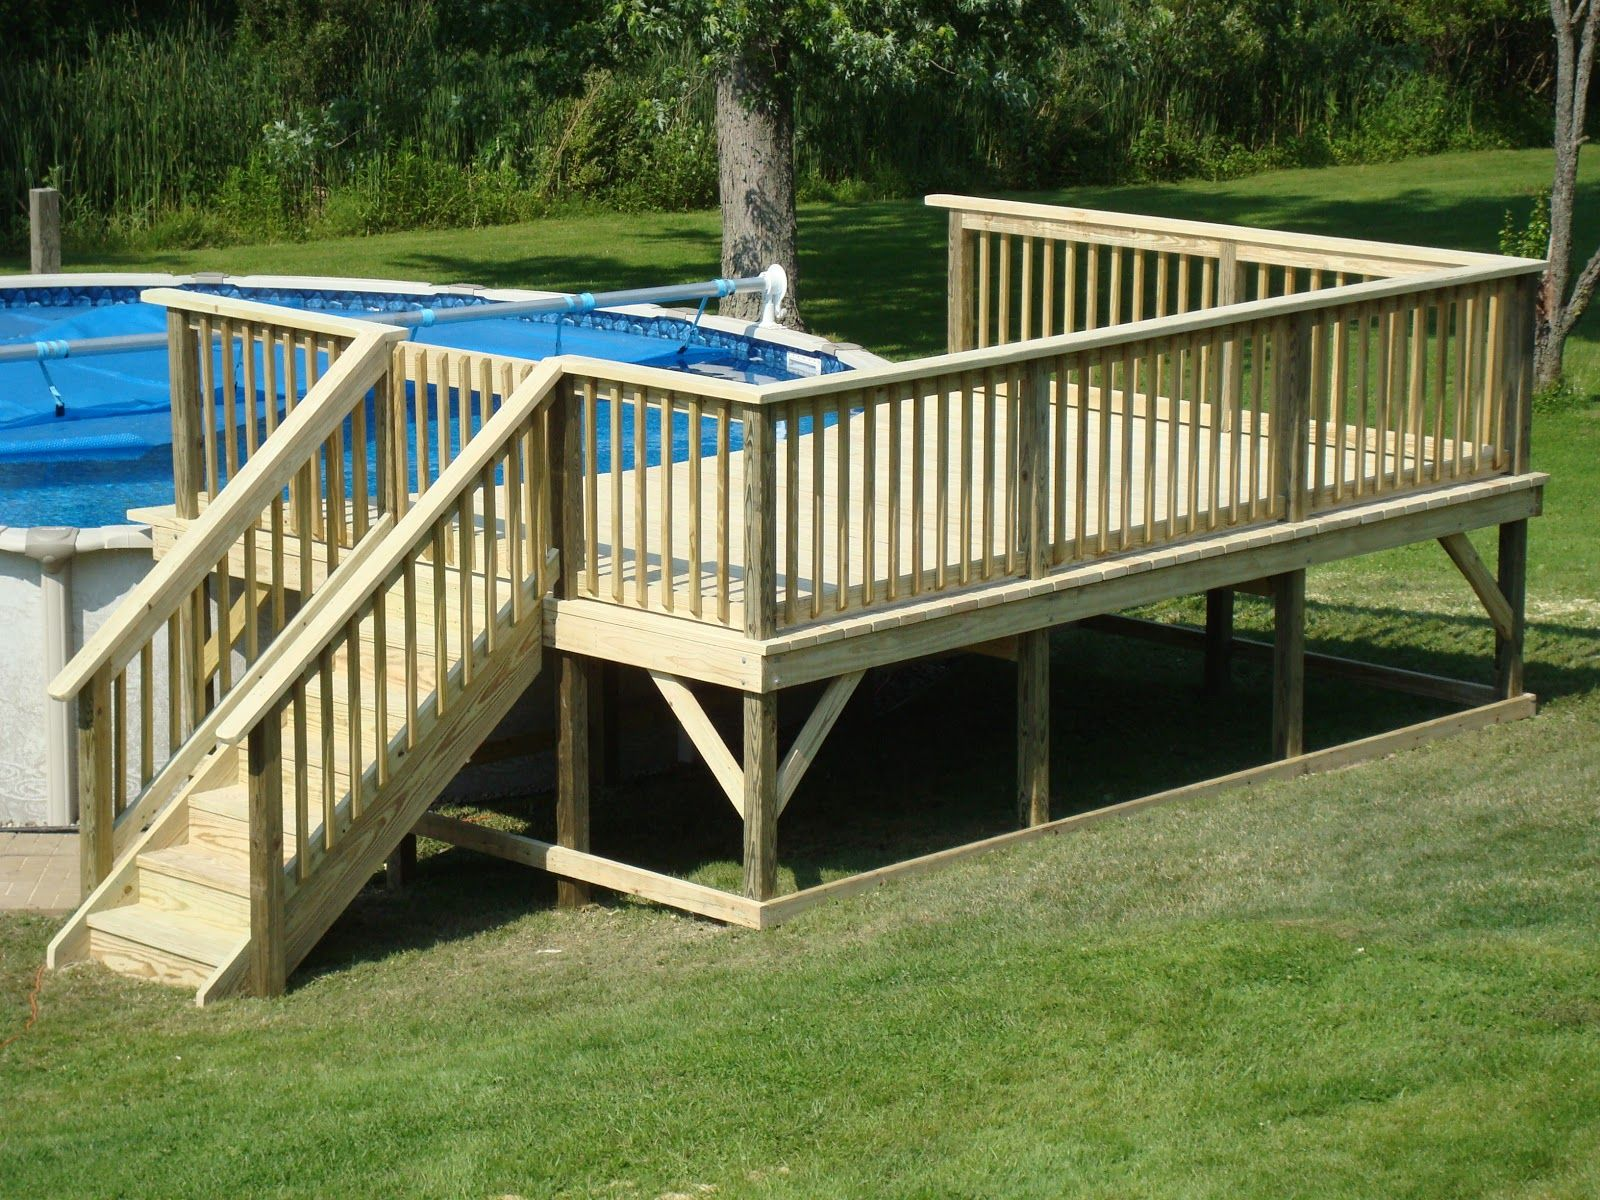 12x16 Skyshot Jpg 1600 1200 Pool Deck Plans Above Ground Pool